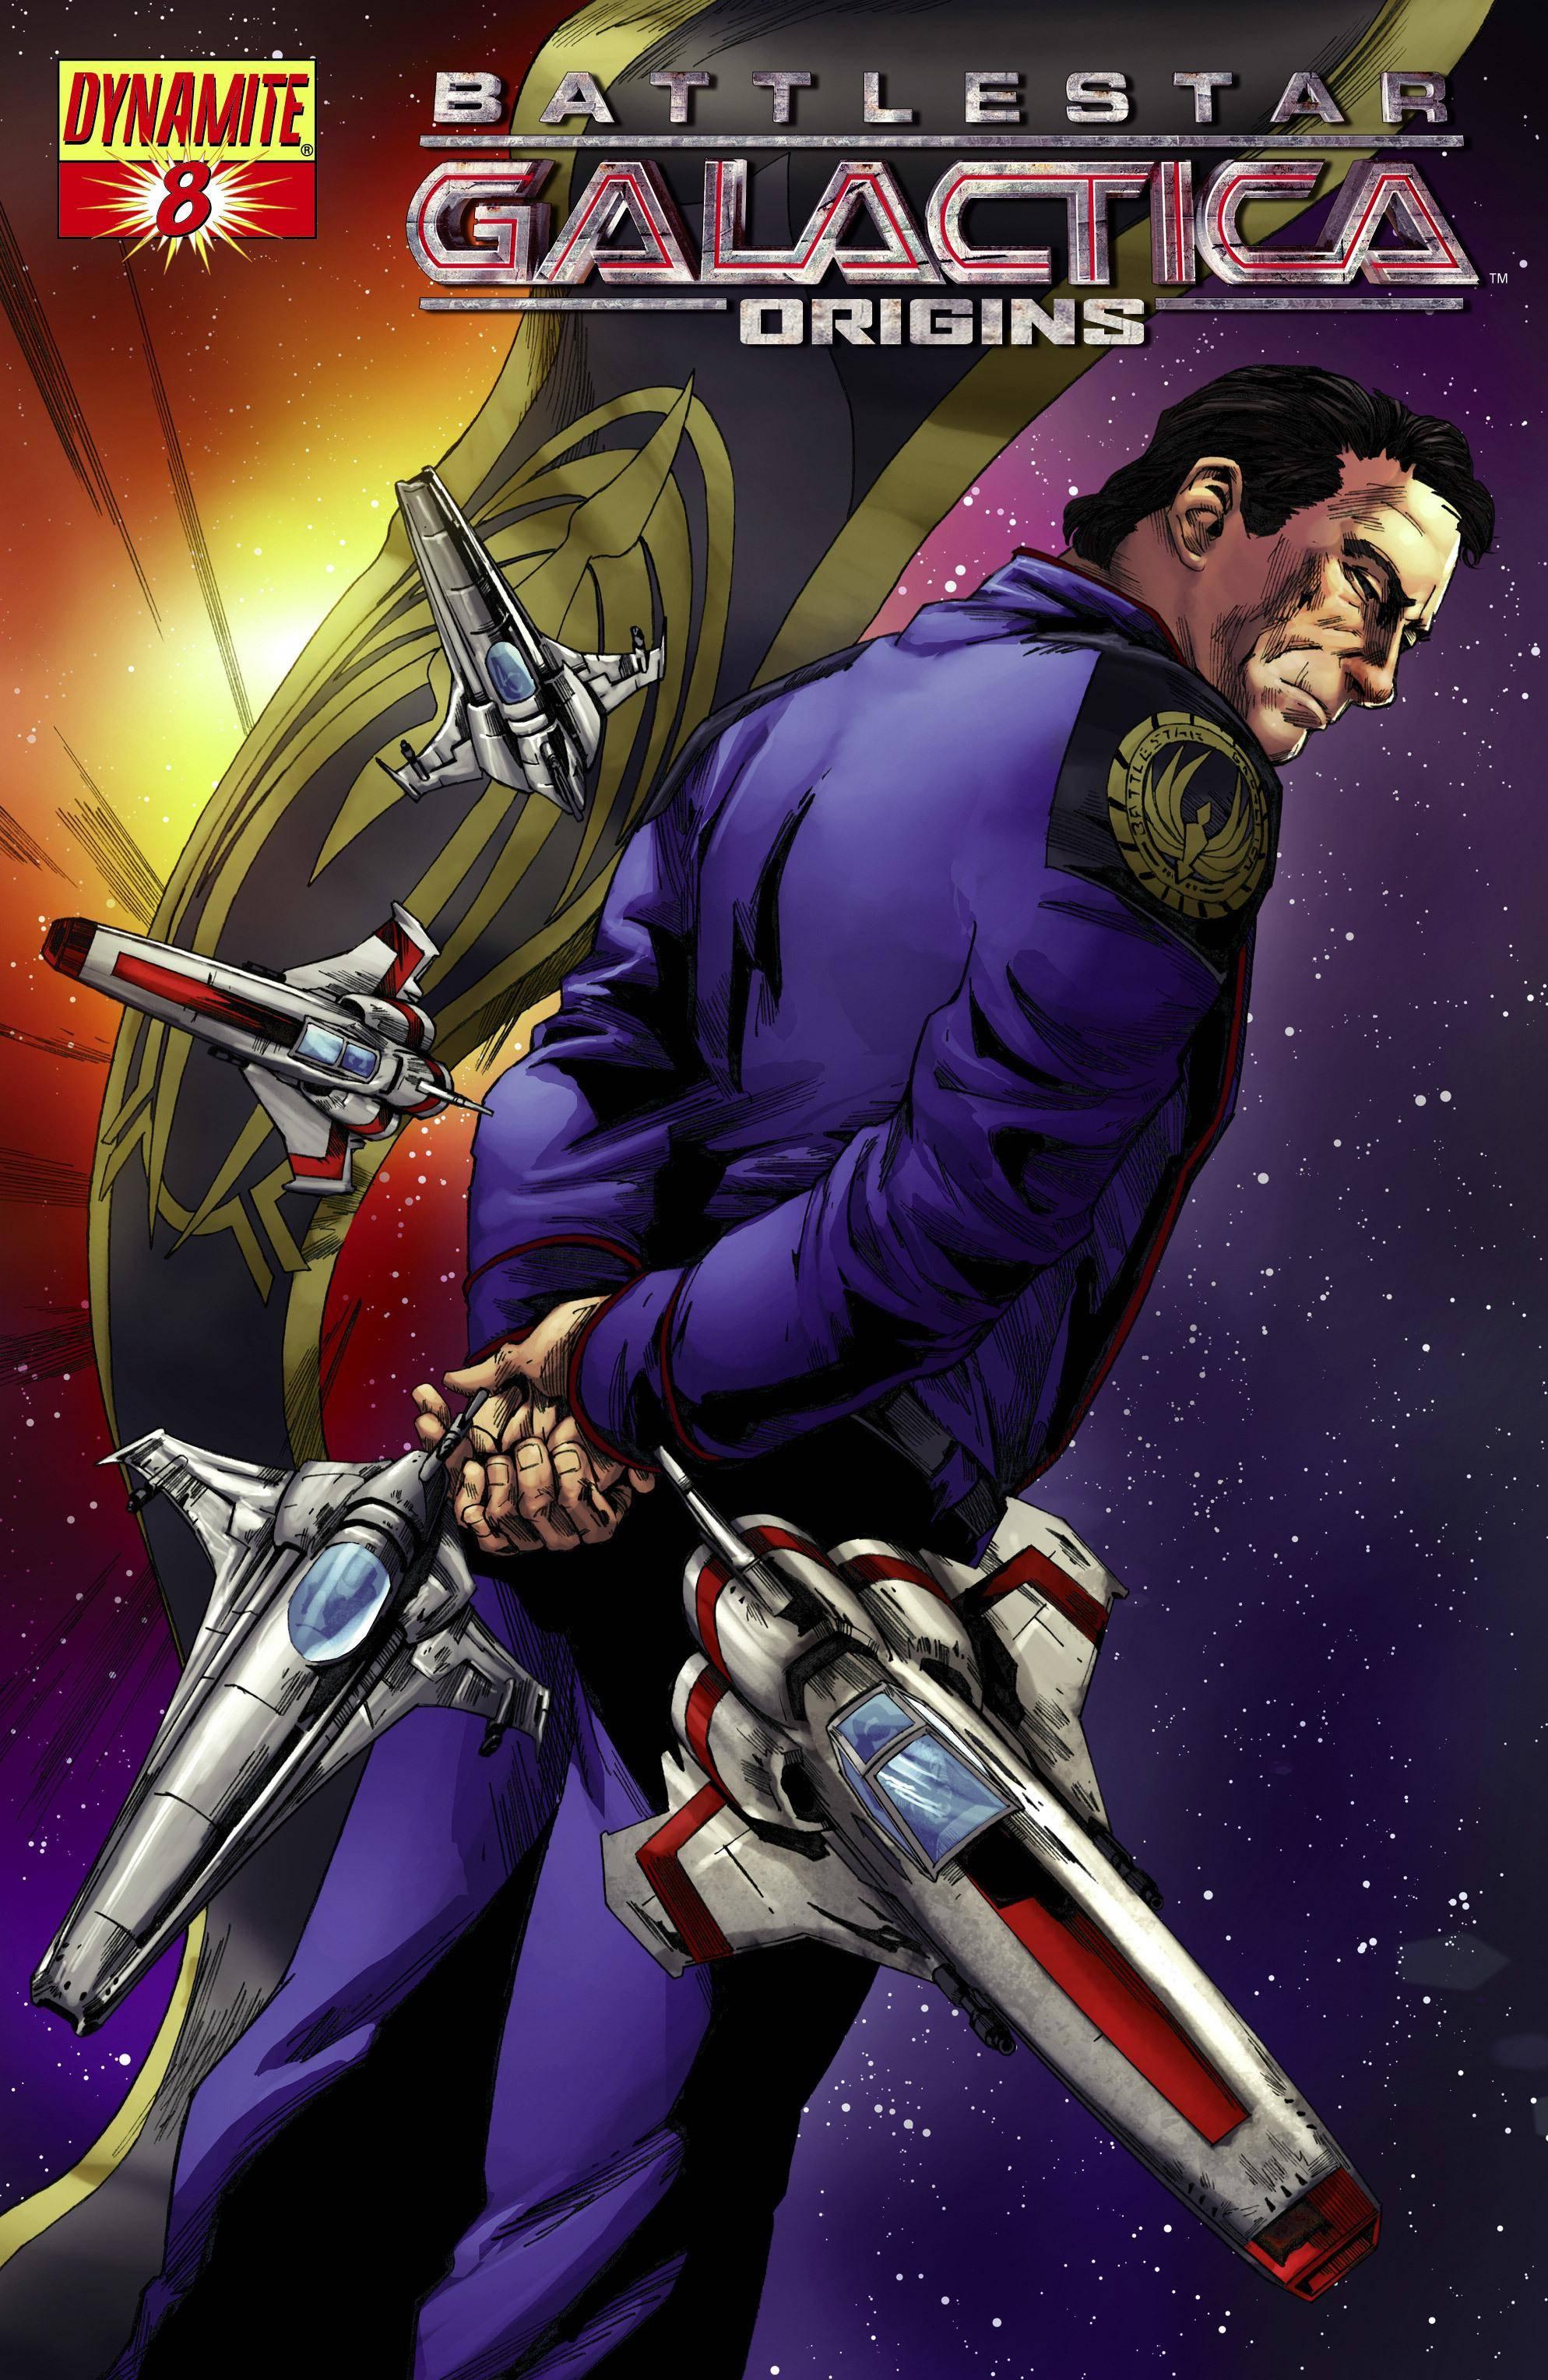 Battlestar Galactica - Origins 008 - Adama 04 of 04 2008 2 covers digital